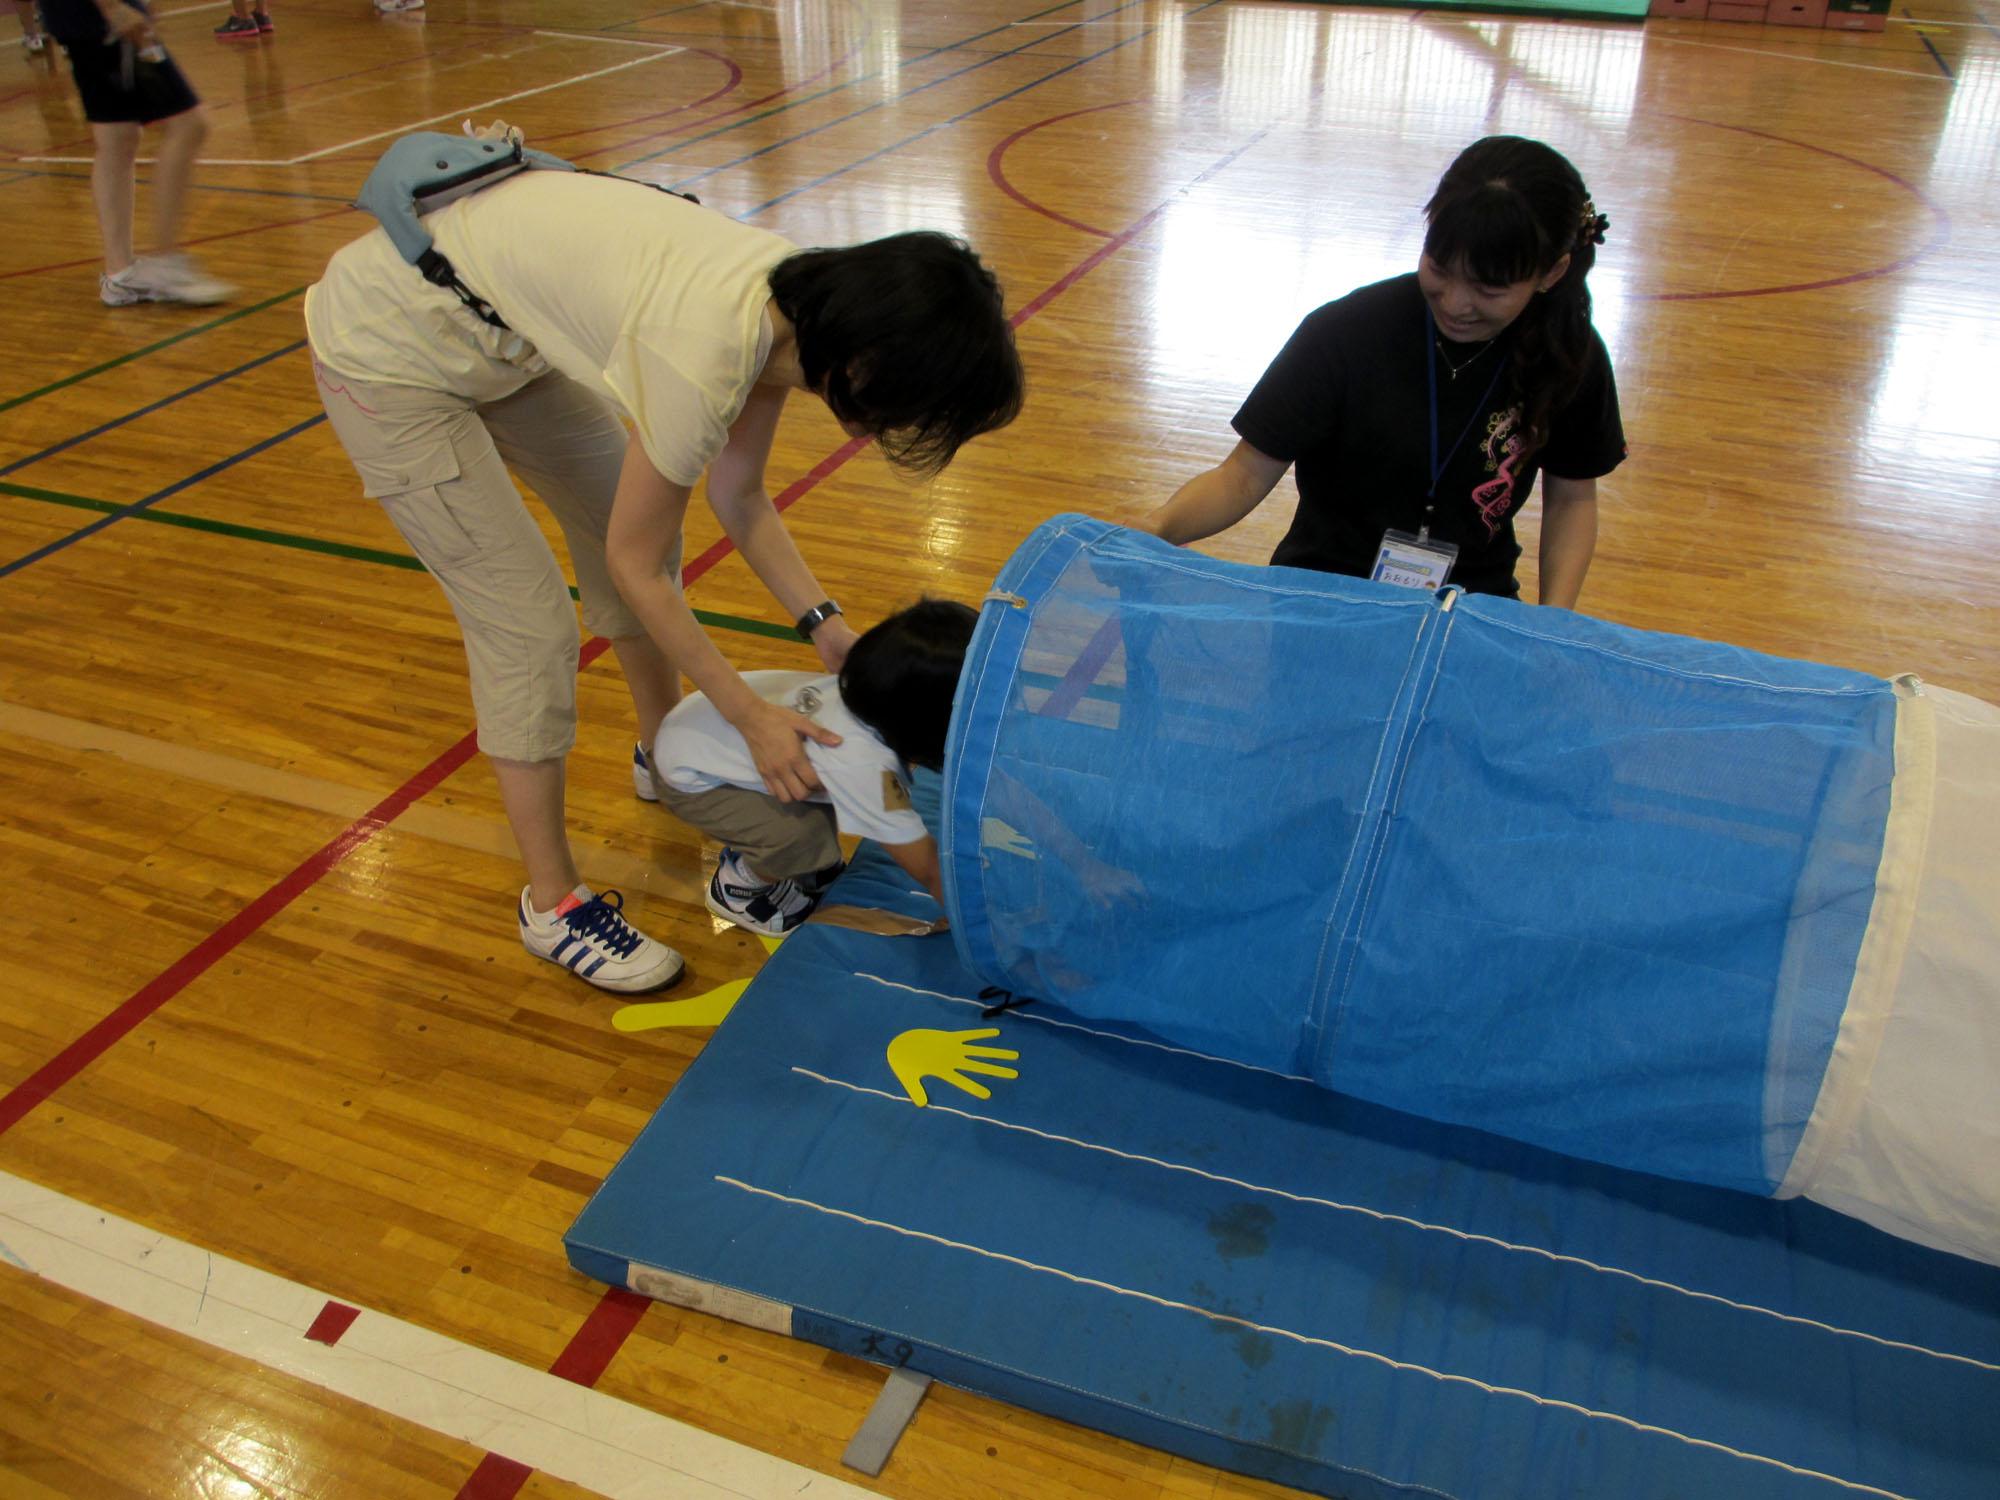 IMG 6971 - 地域振興事業より・・・小平市きっずスポーツ教室